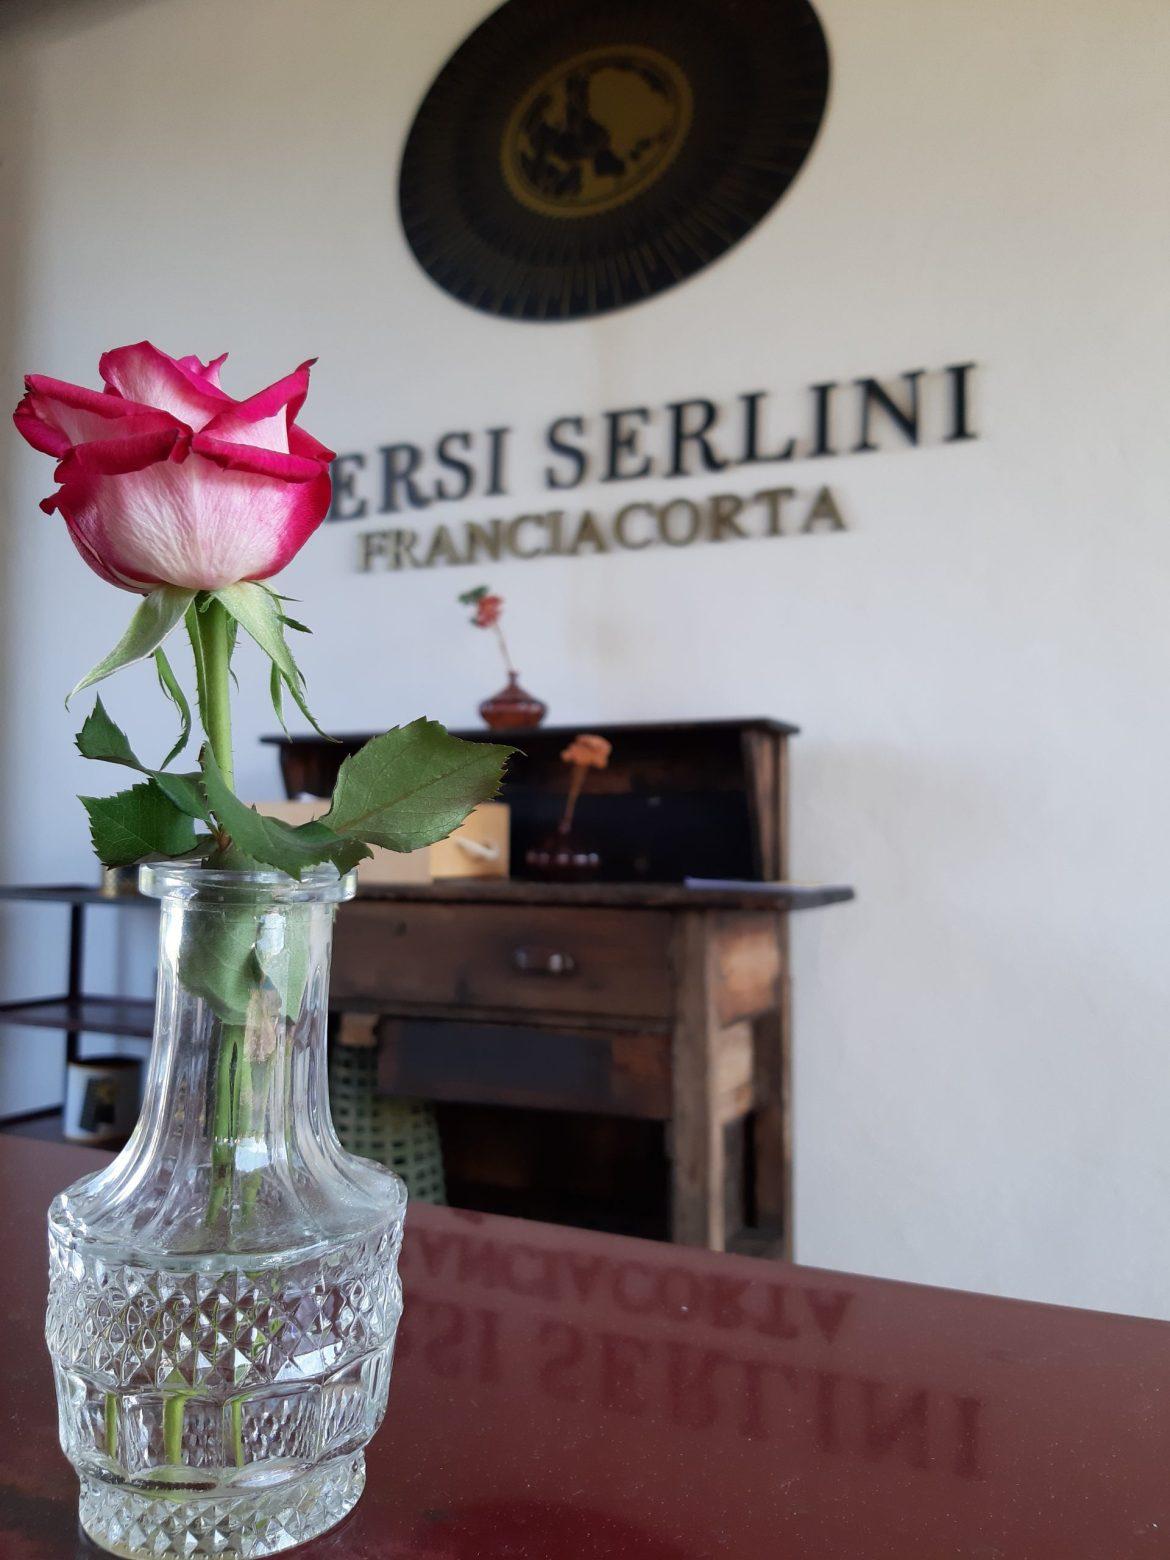 Entrada da vinícola Bersi Serlini.